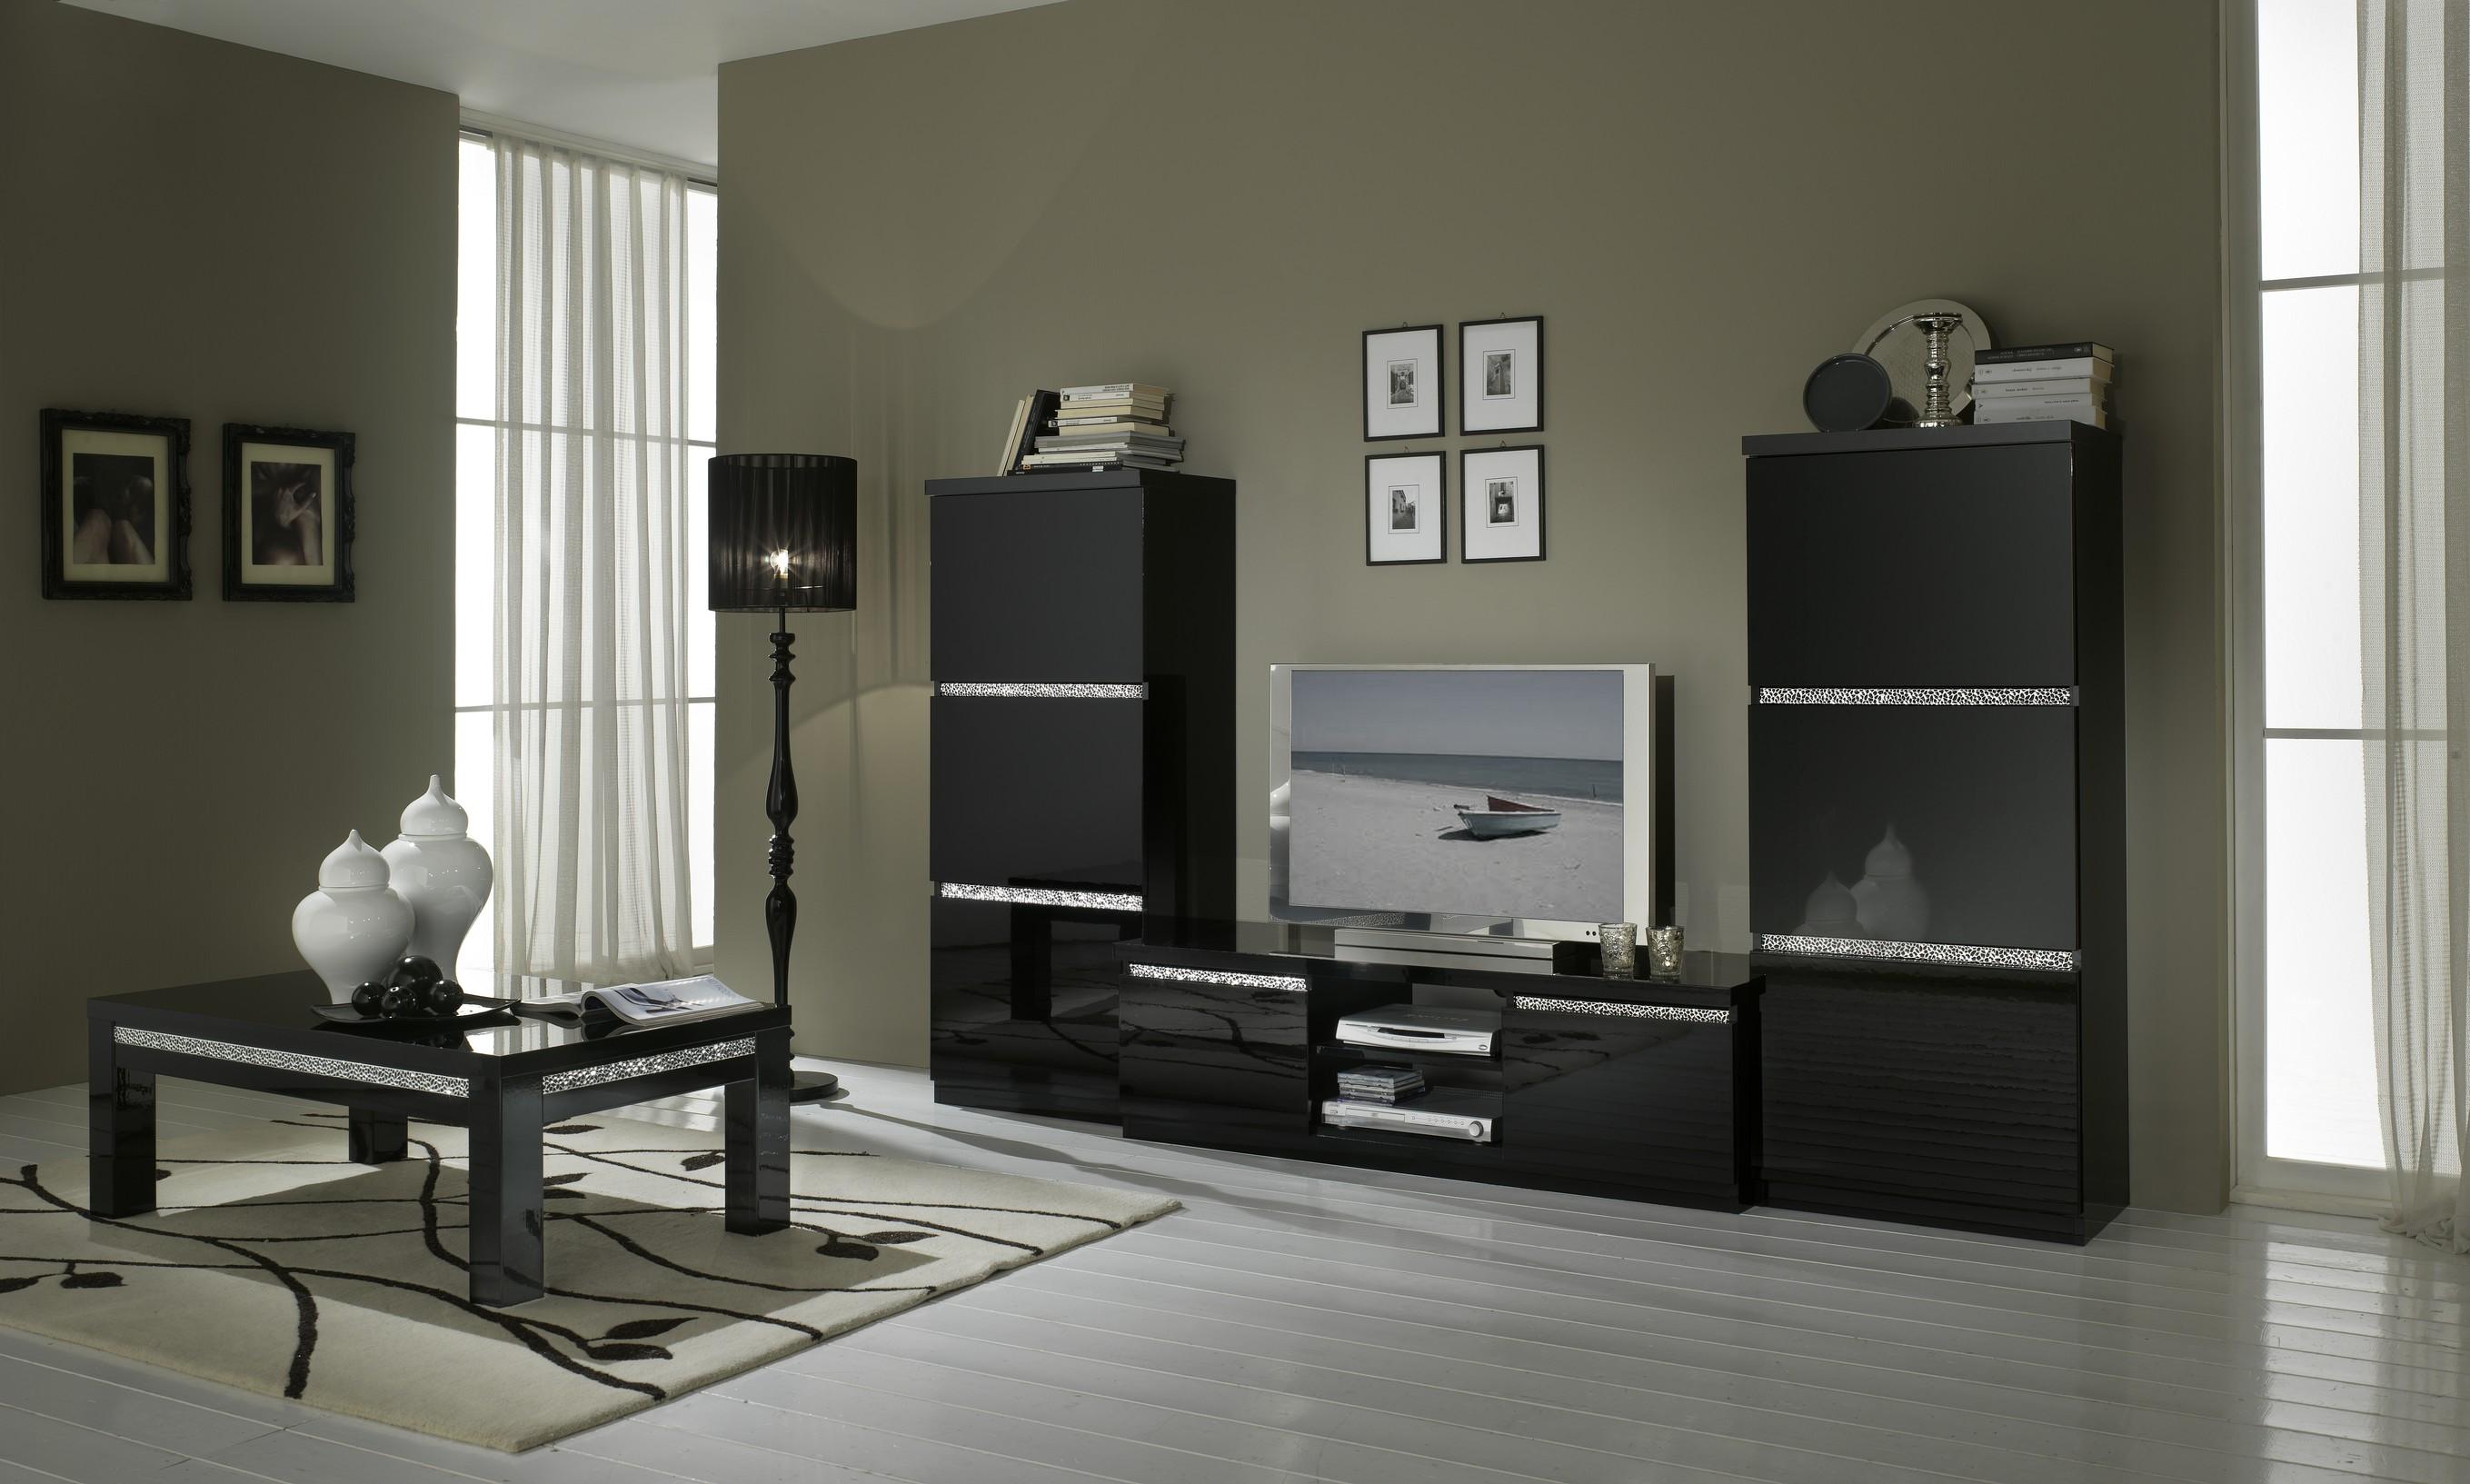 Amor Cromo Meuble Tv Coloris Noir Laqu Modiva # Meuble De Tv Noir Laque